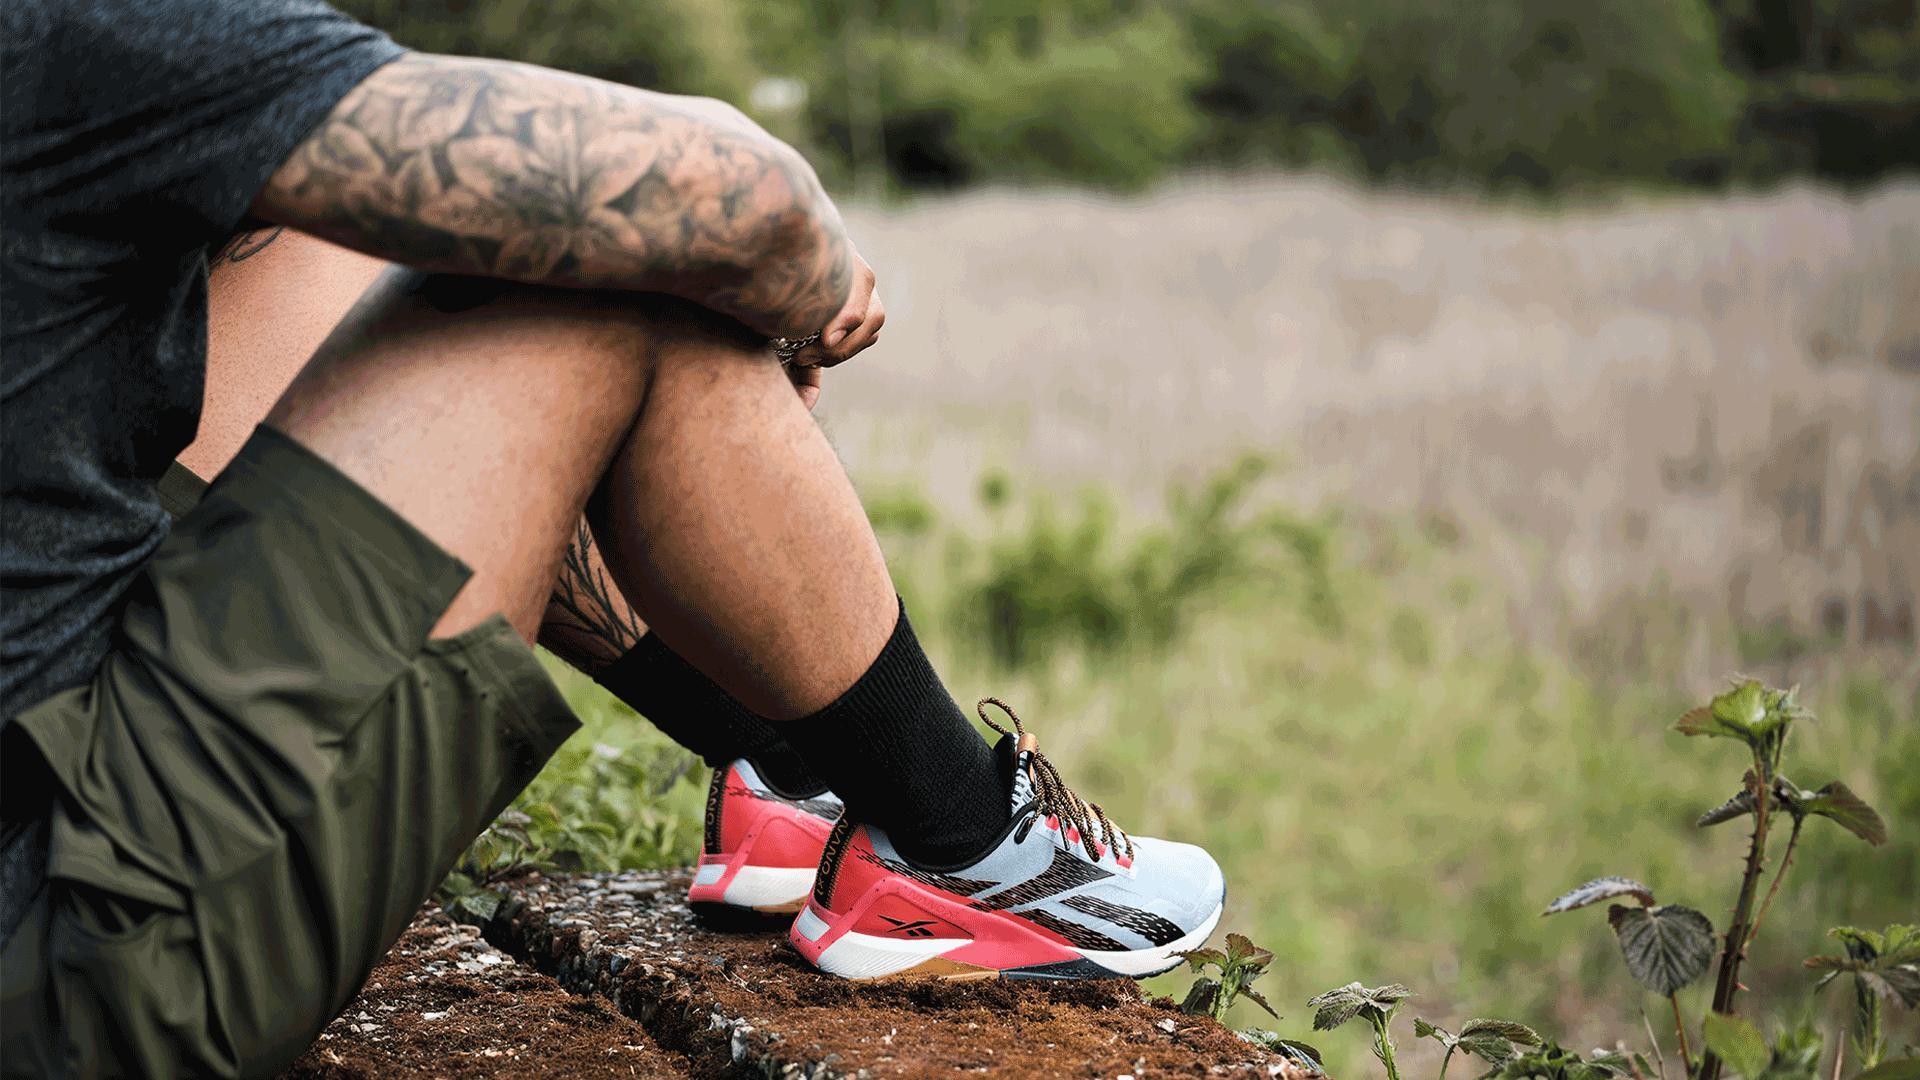 Reebok's Nano X1 Adventure training shoe | Resting on a rock after a hike